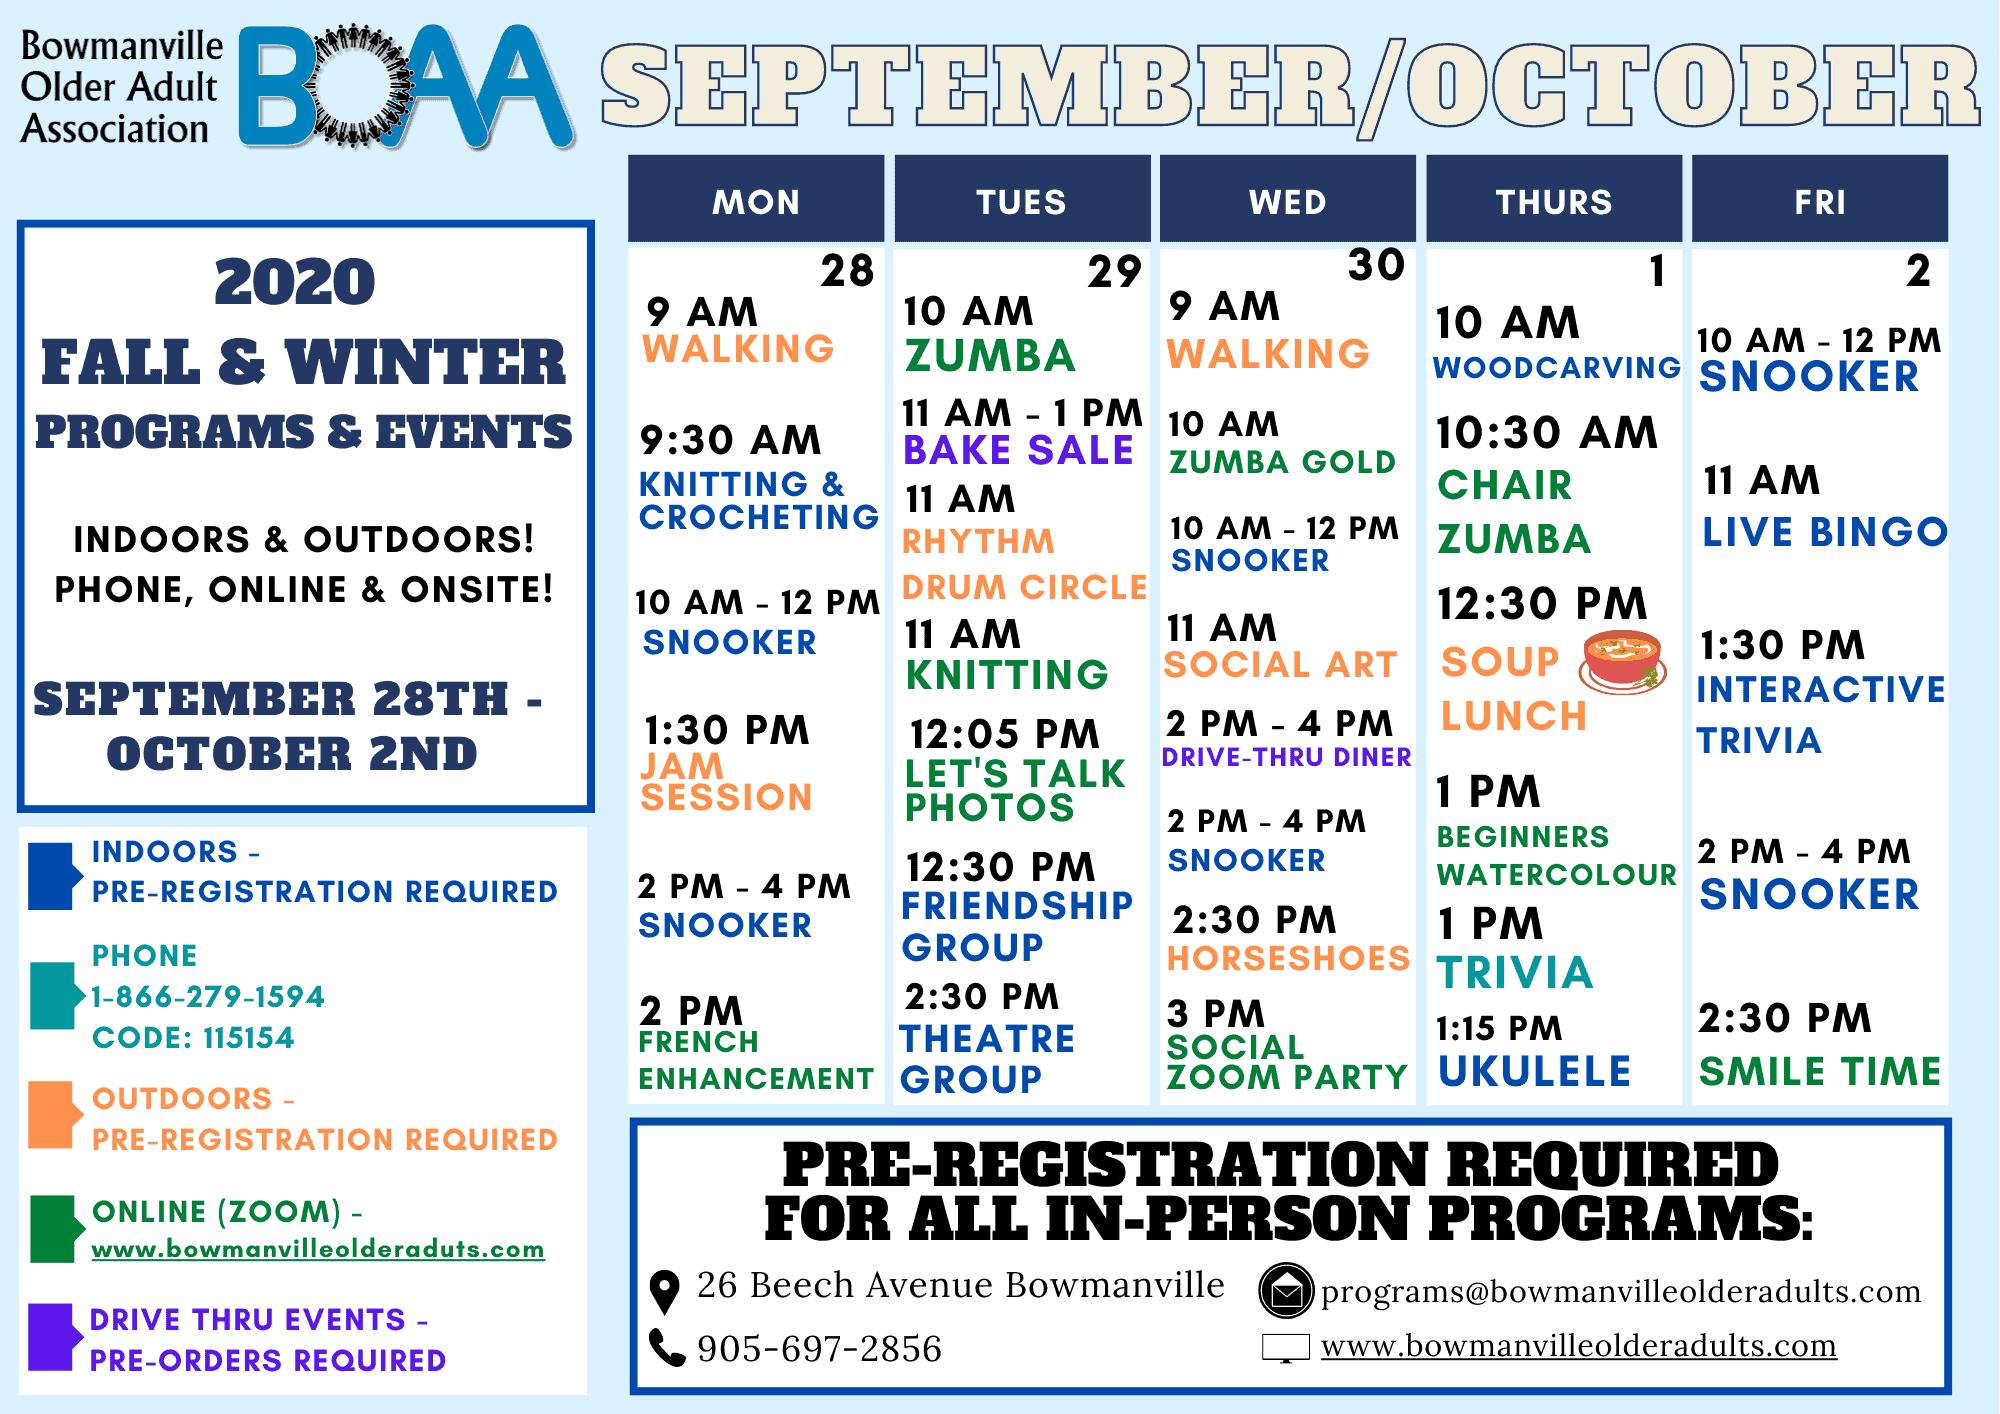 BOAA's NEW 2020 Fall & Winter Programming – WEEK 3!